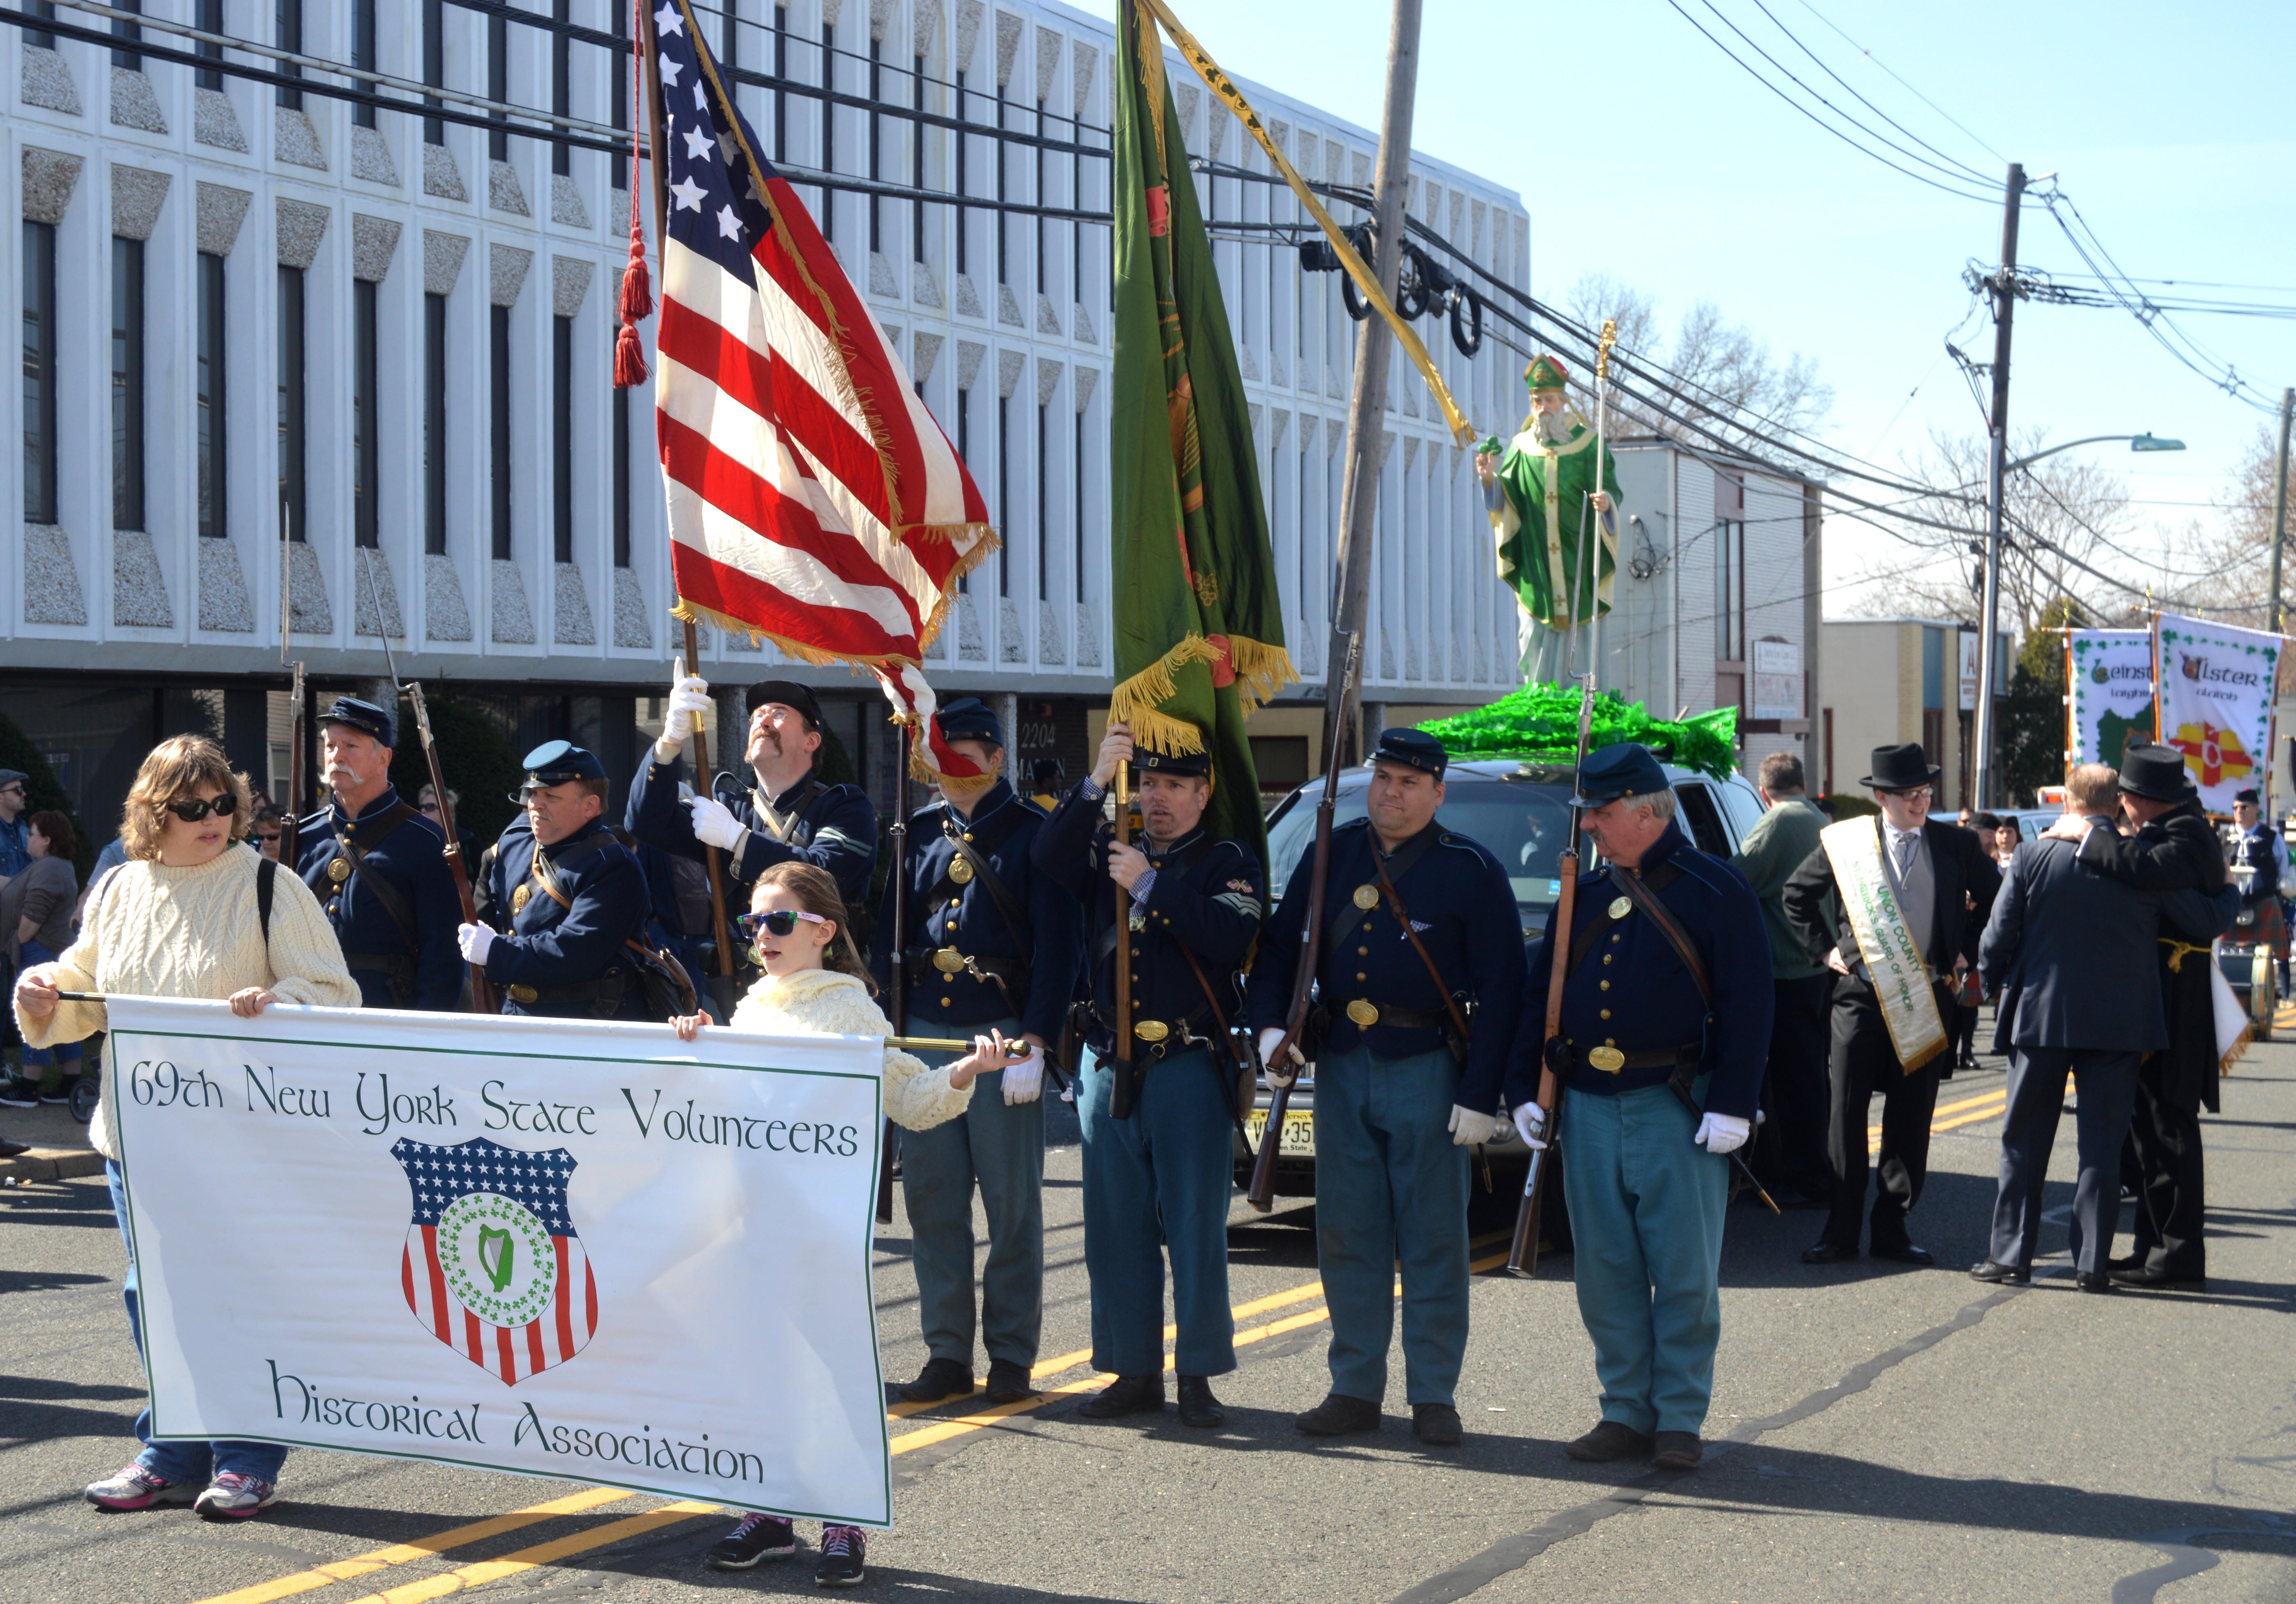 6f8d0aa7f8a43a8febd9_St._Patrick_s_Day_2016_-_Fighting_69th.JPG